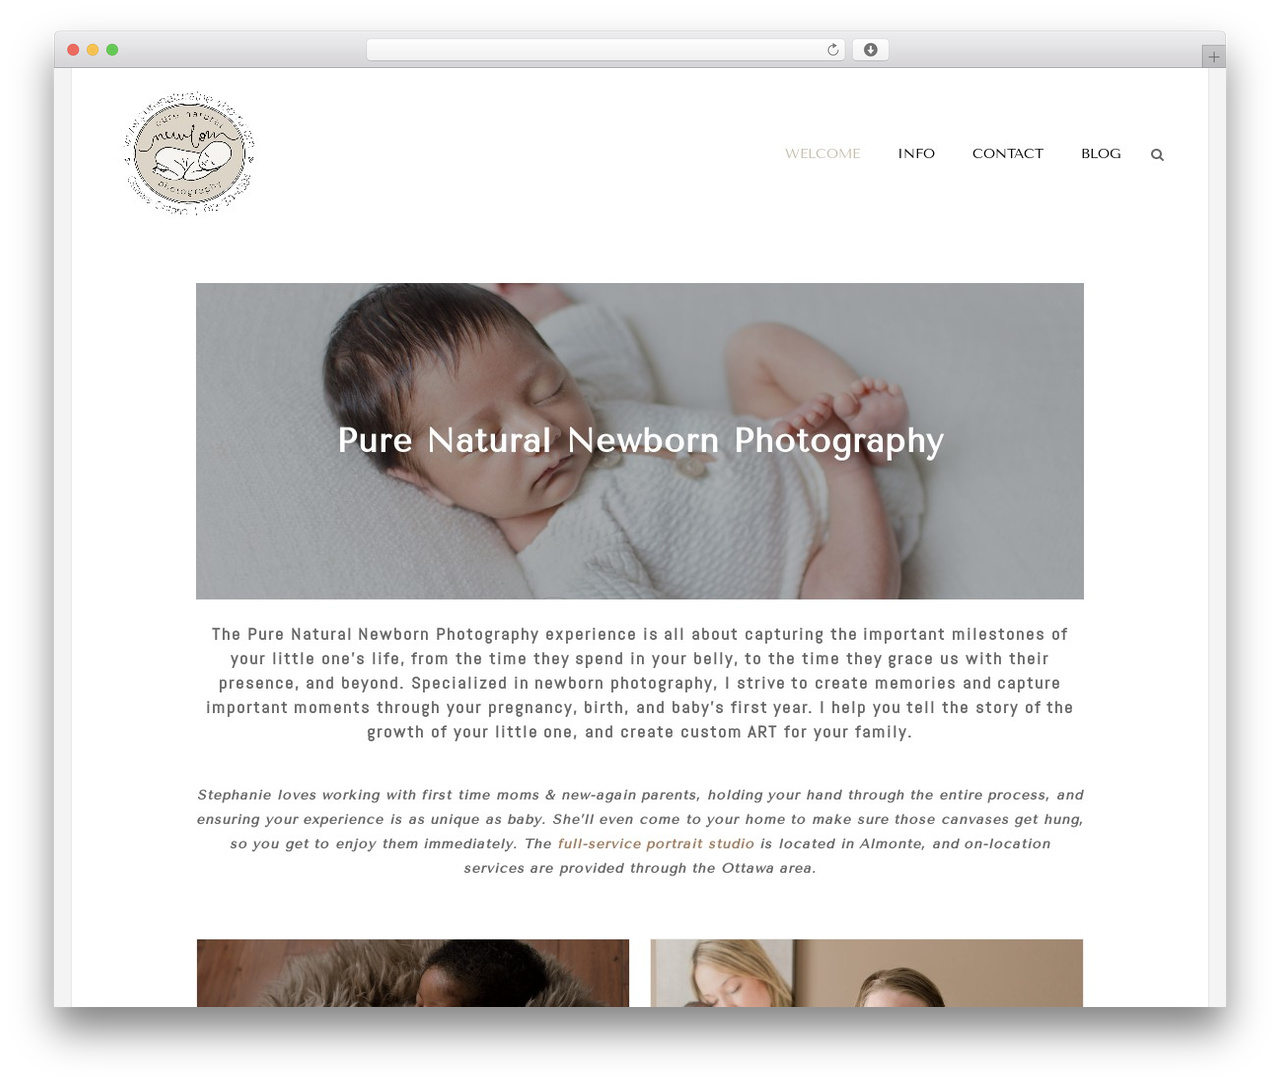 Homa WordPress template for photographers - purenaturalnewborn.com